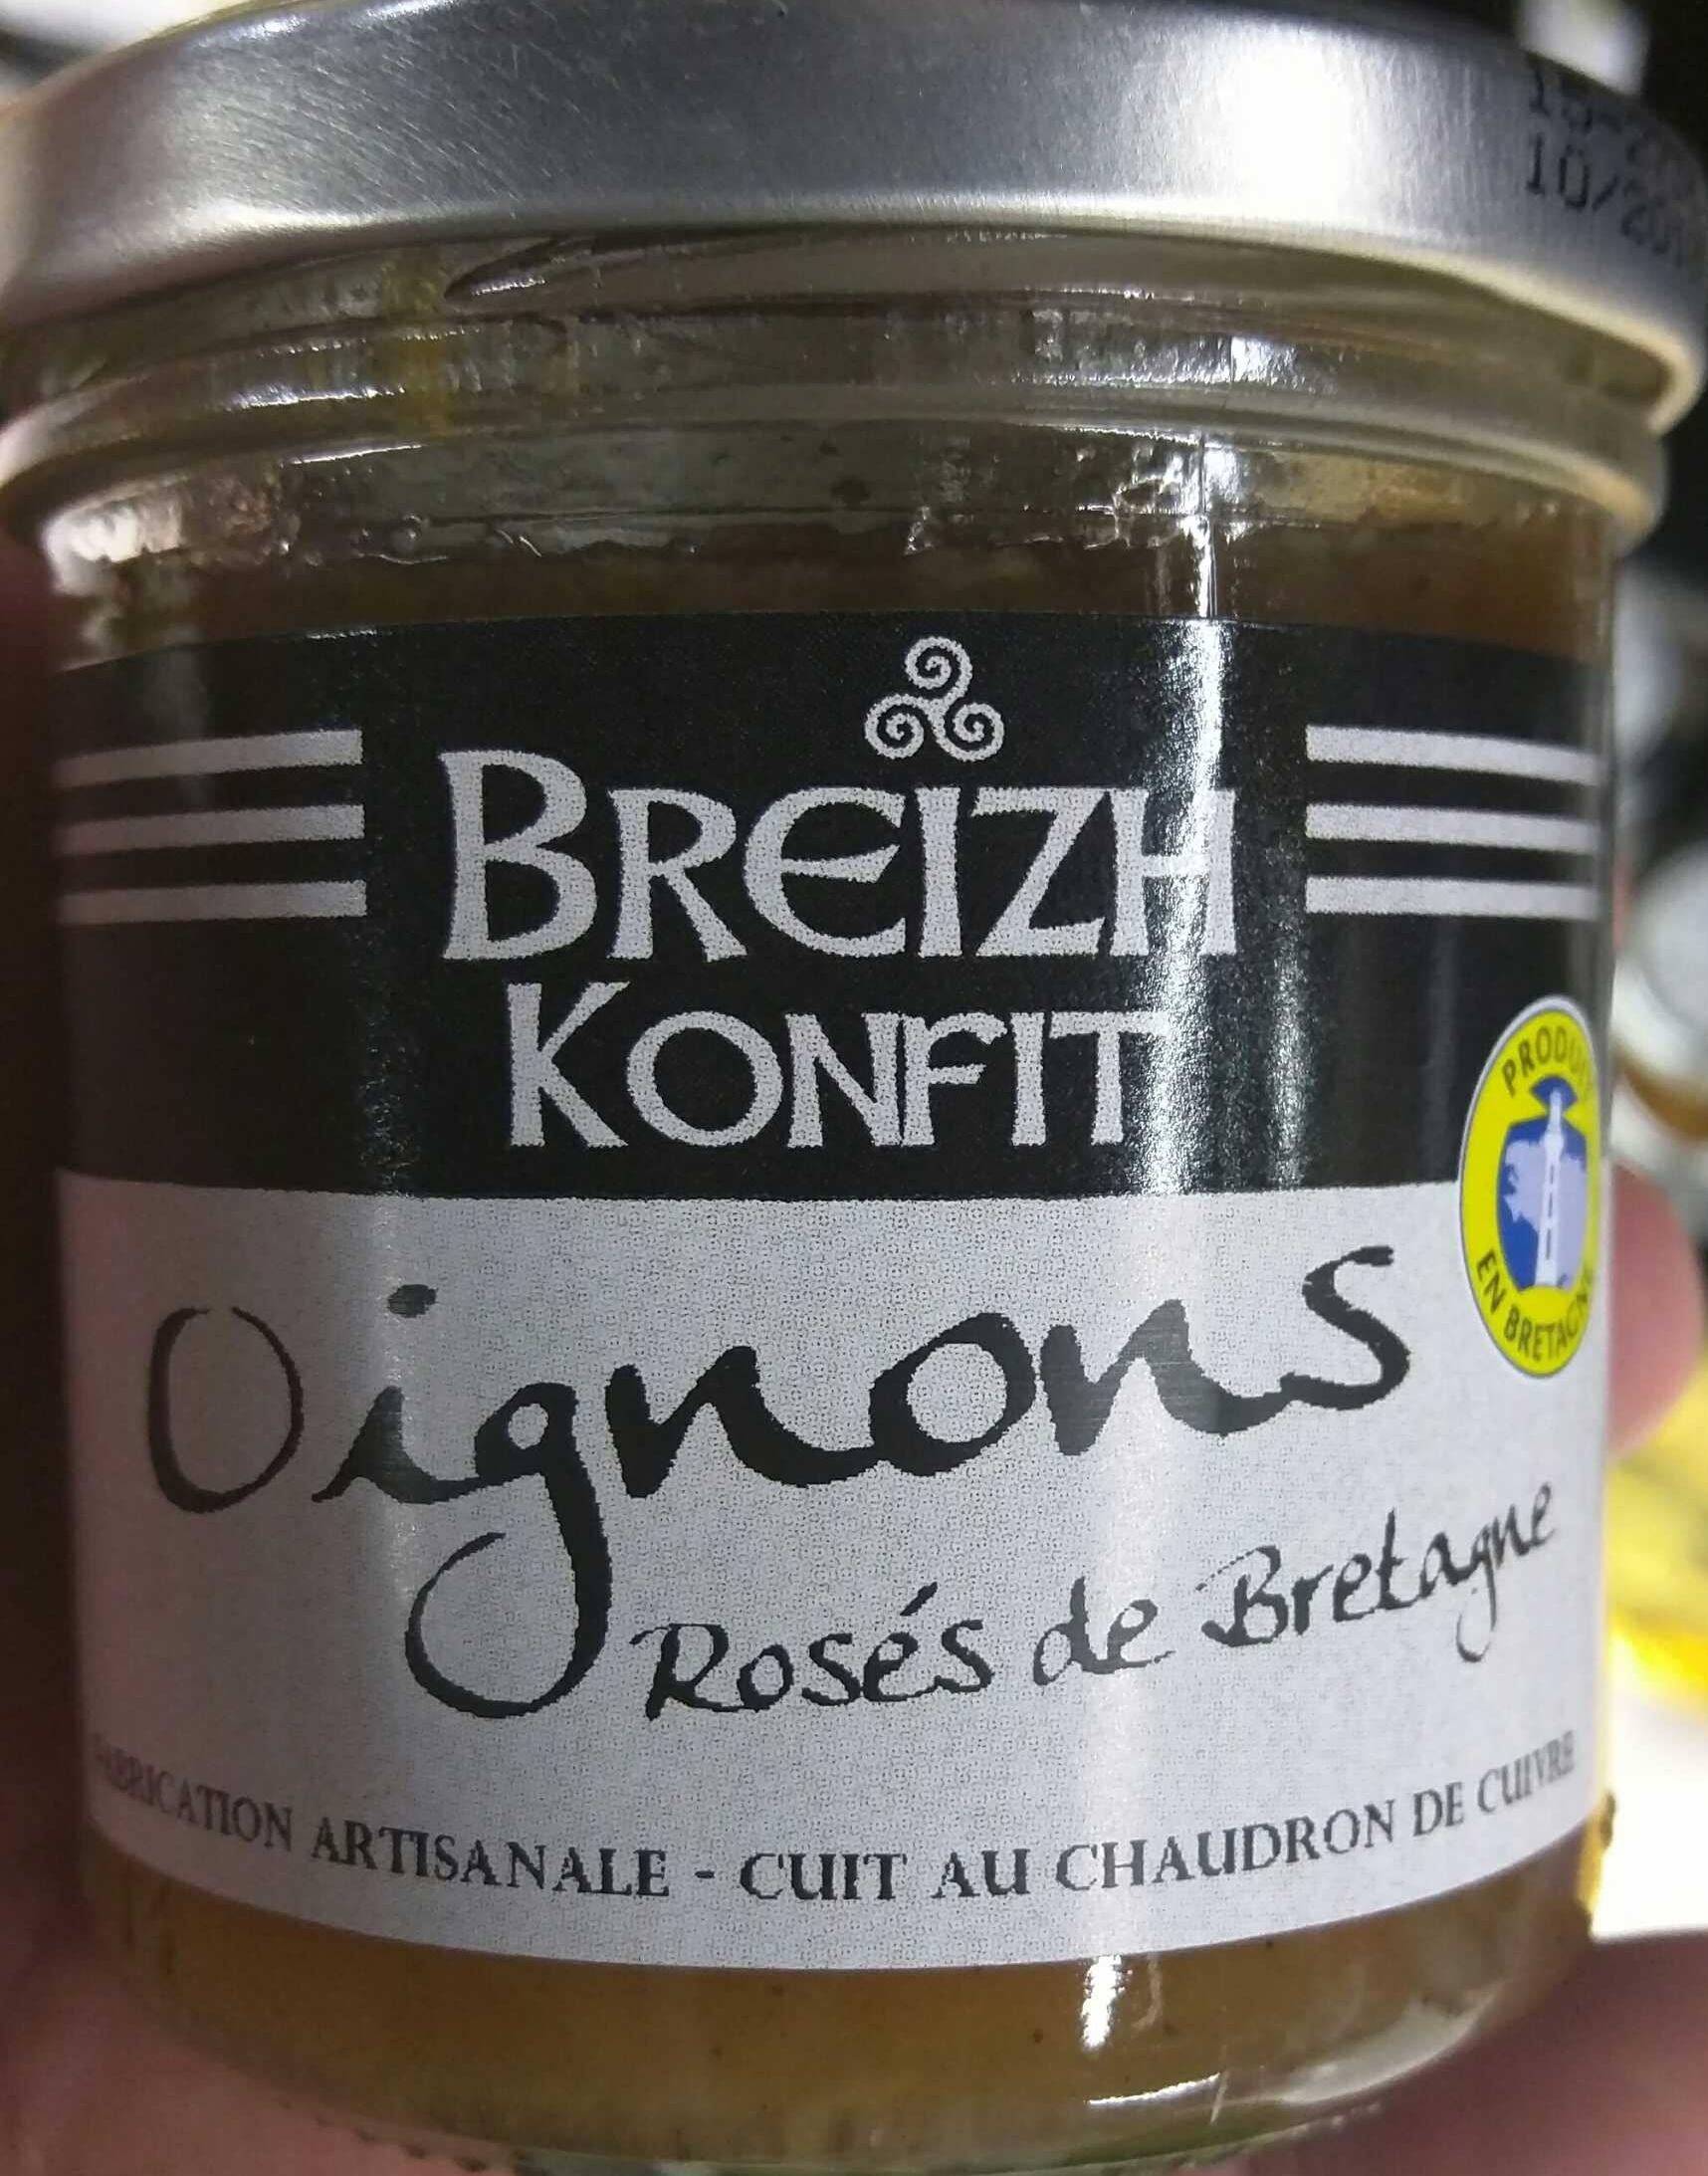 Oignons Rosés de Bretagne - Product